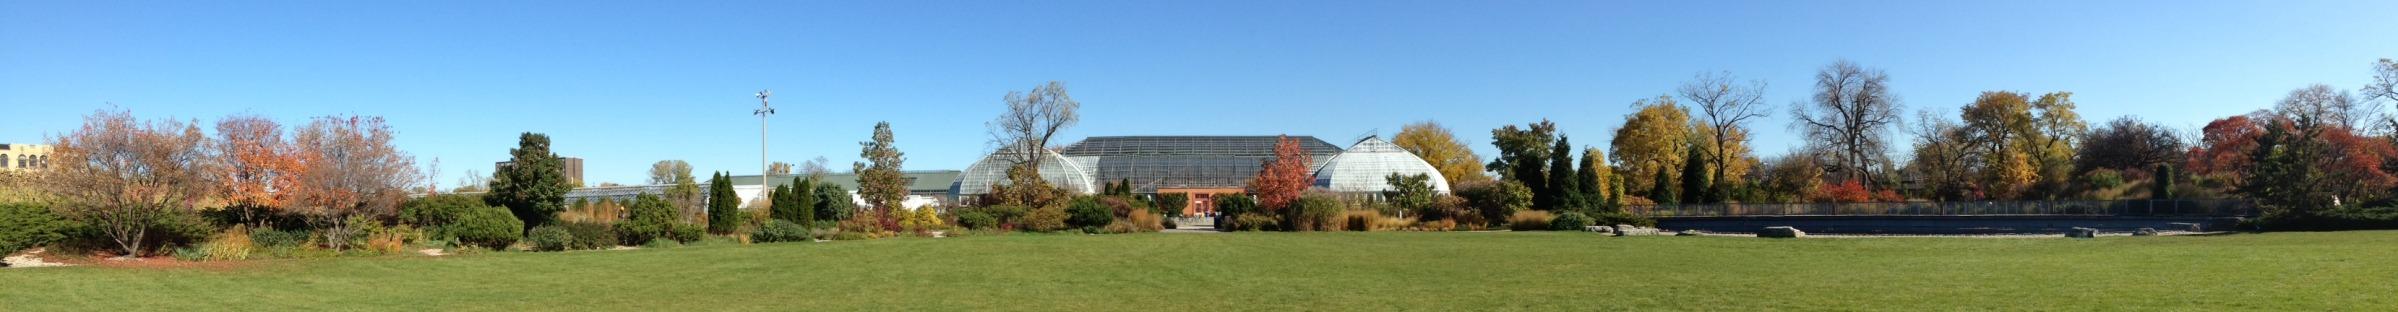 Outdoor Gardens Garfield Park Conservatory